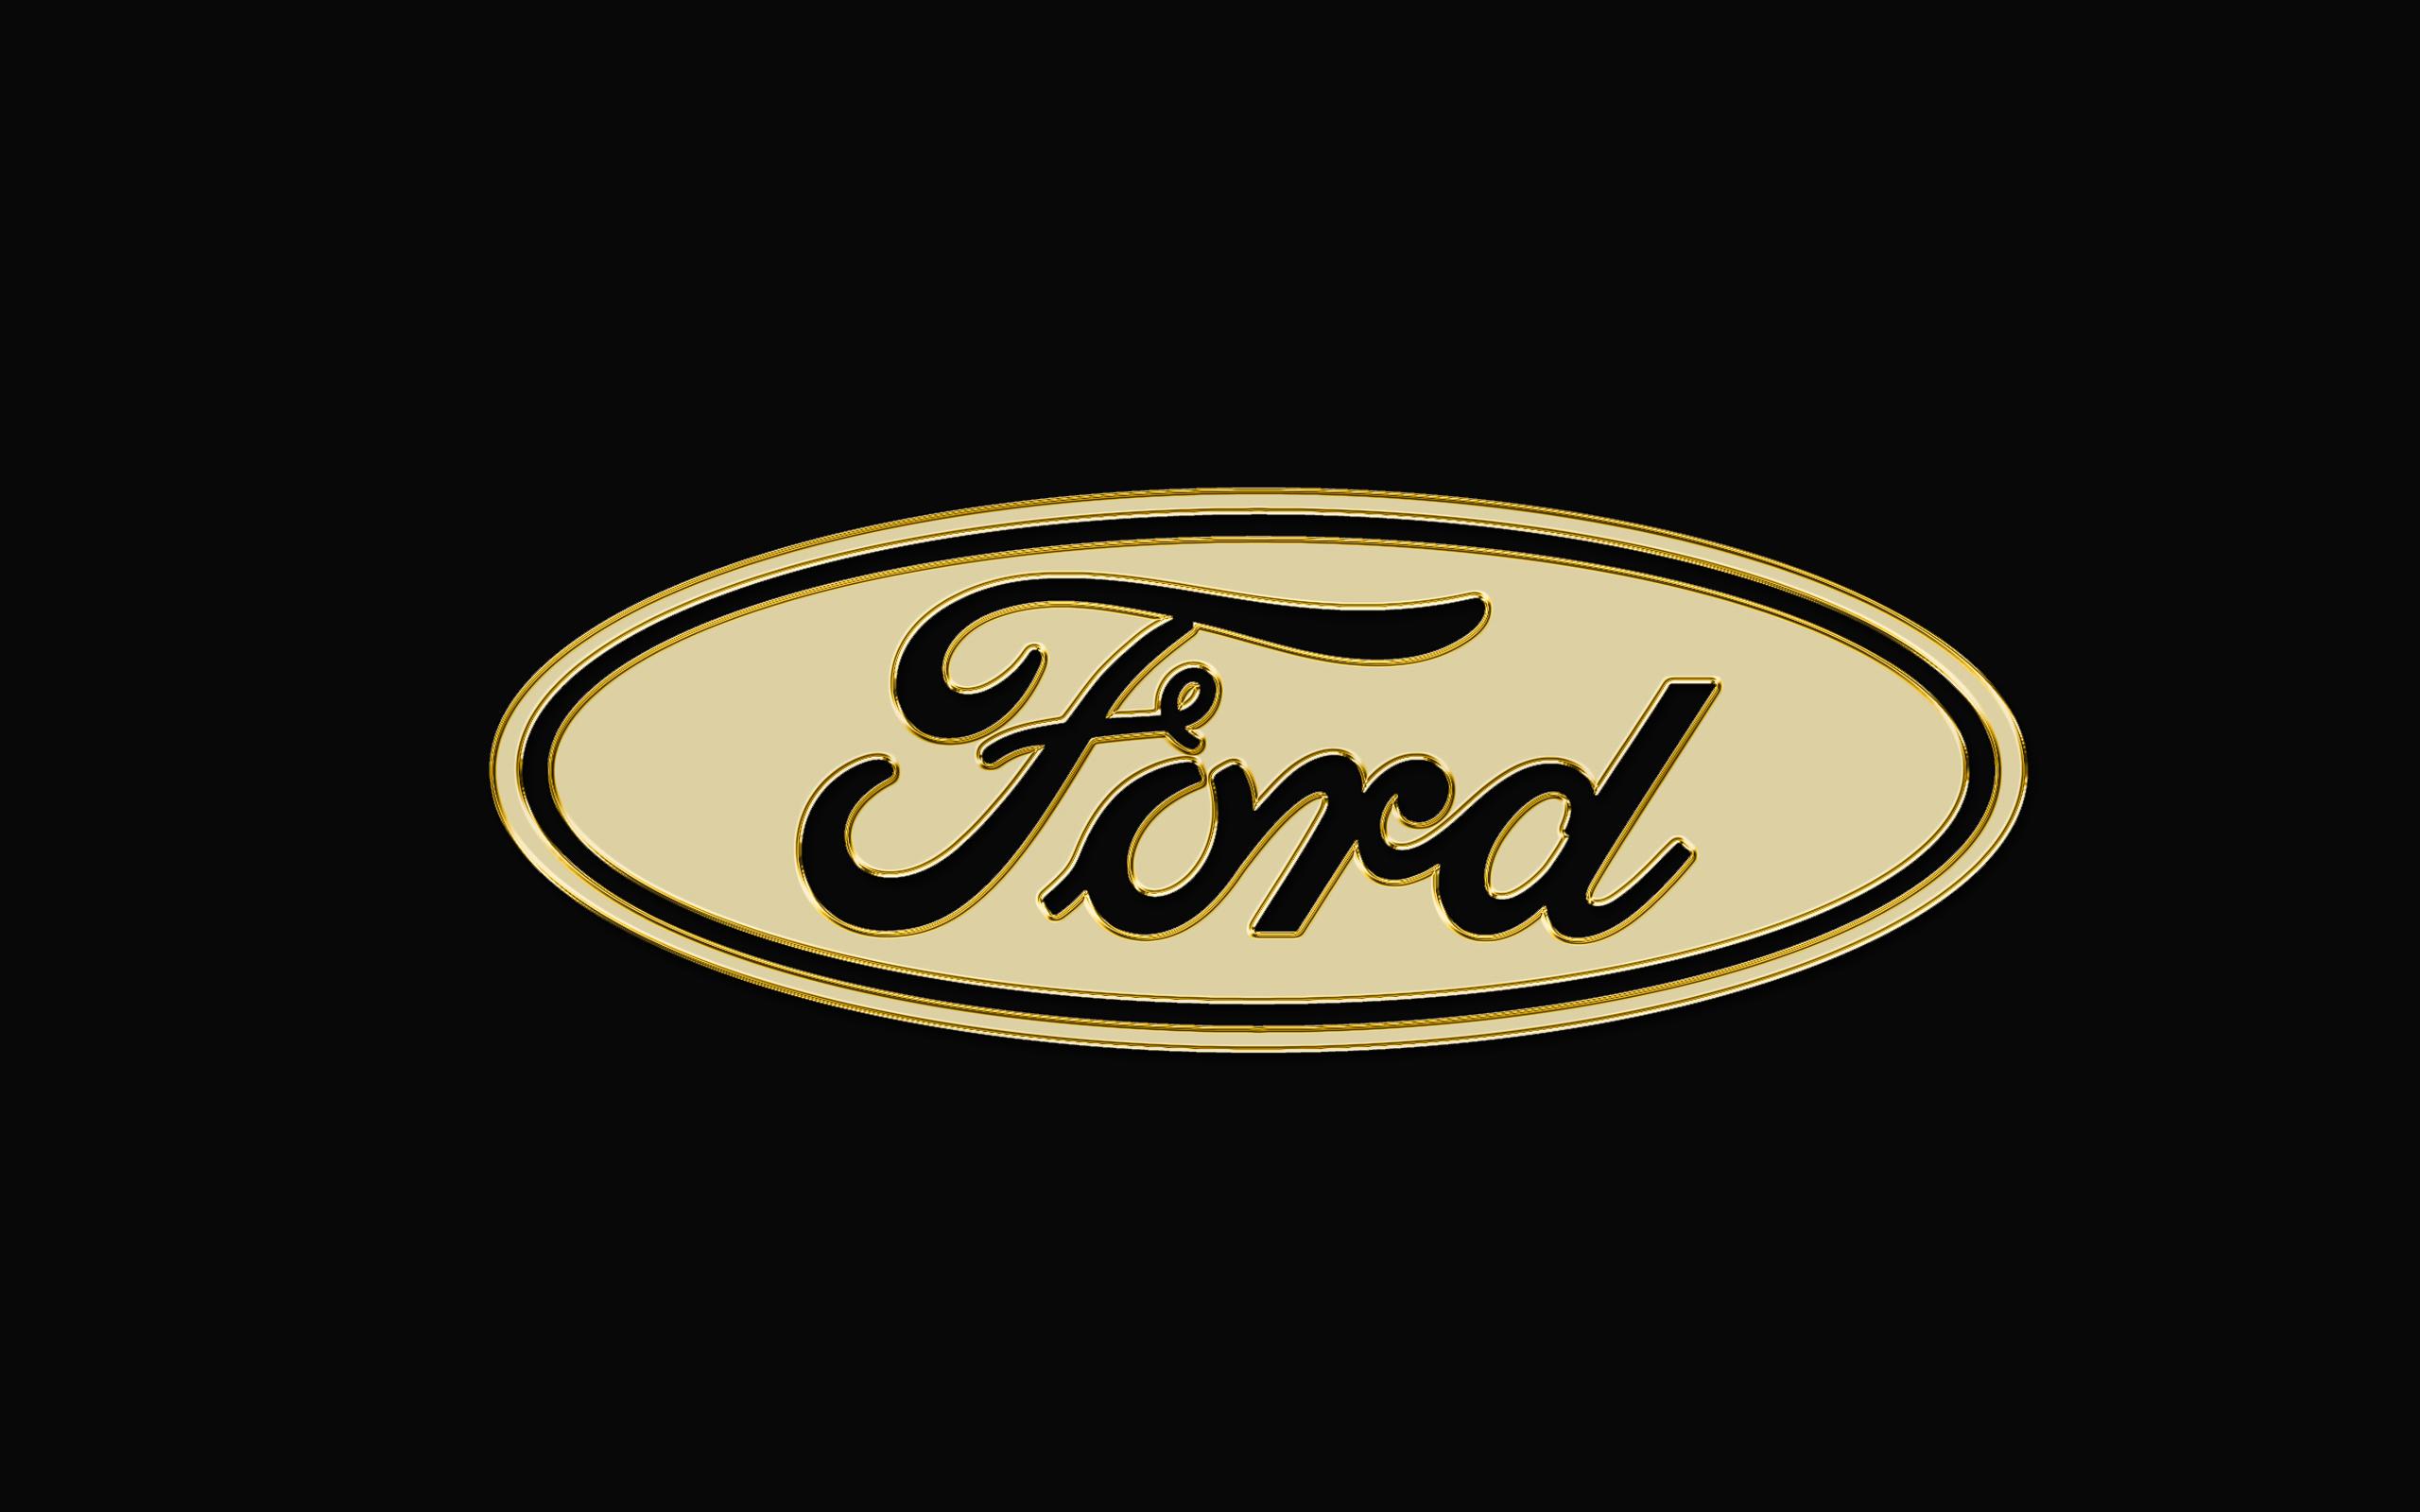 free ford logo 2 ohm wiring diagram wallpapers pixelstalk net